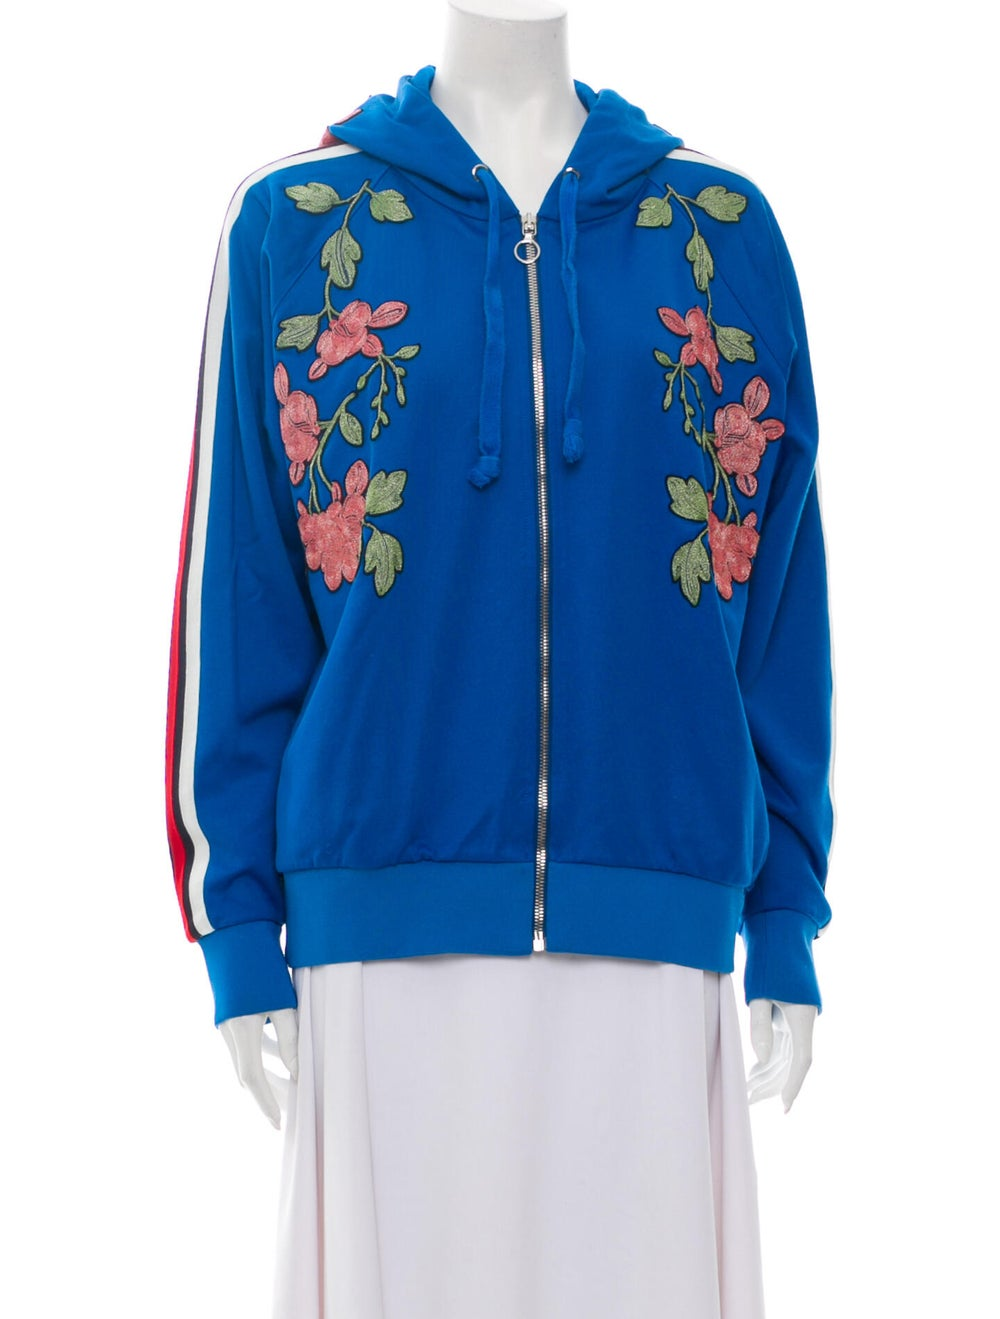 Gucci 2017 Floral Print Sweatshirt Blue - image 1